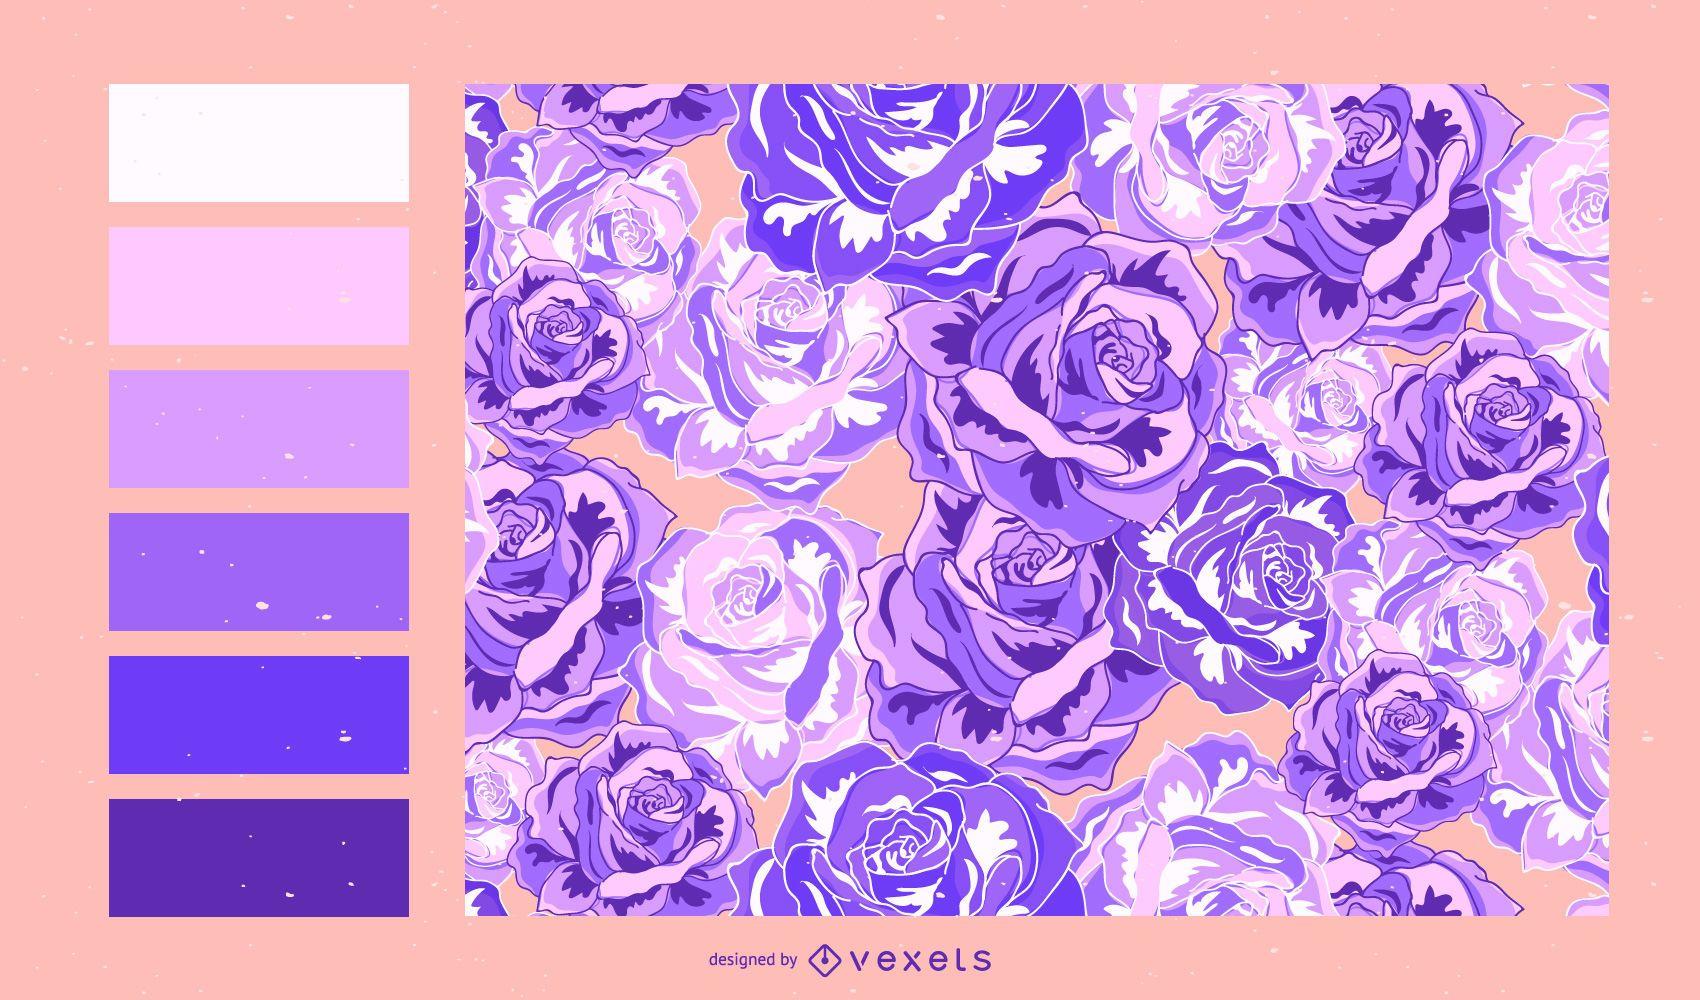 Floral pattern design with color palette